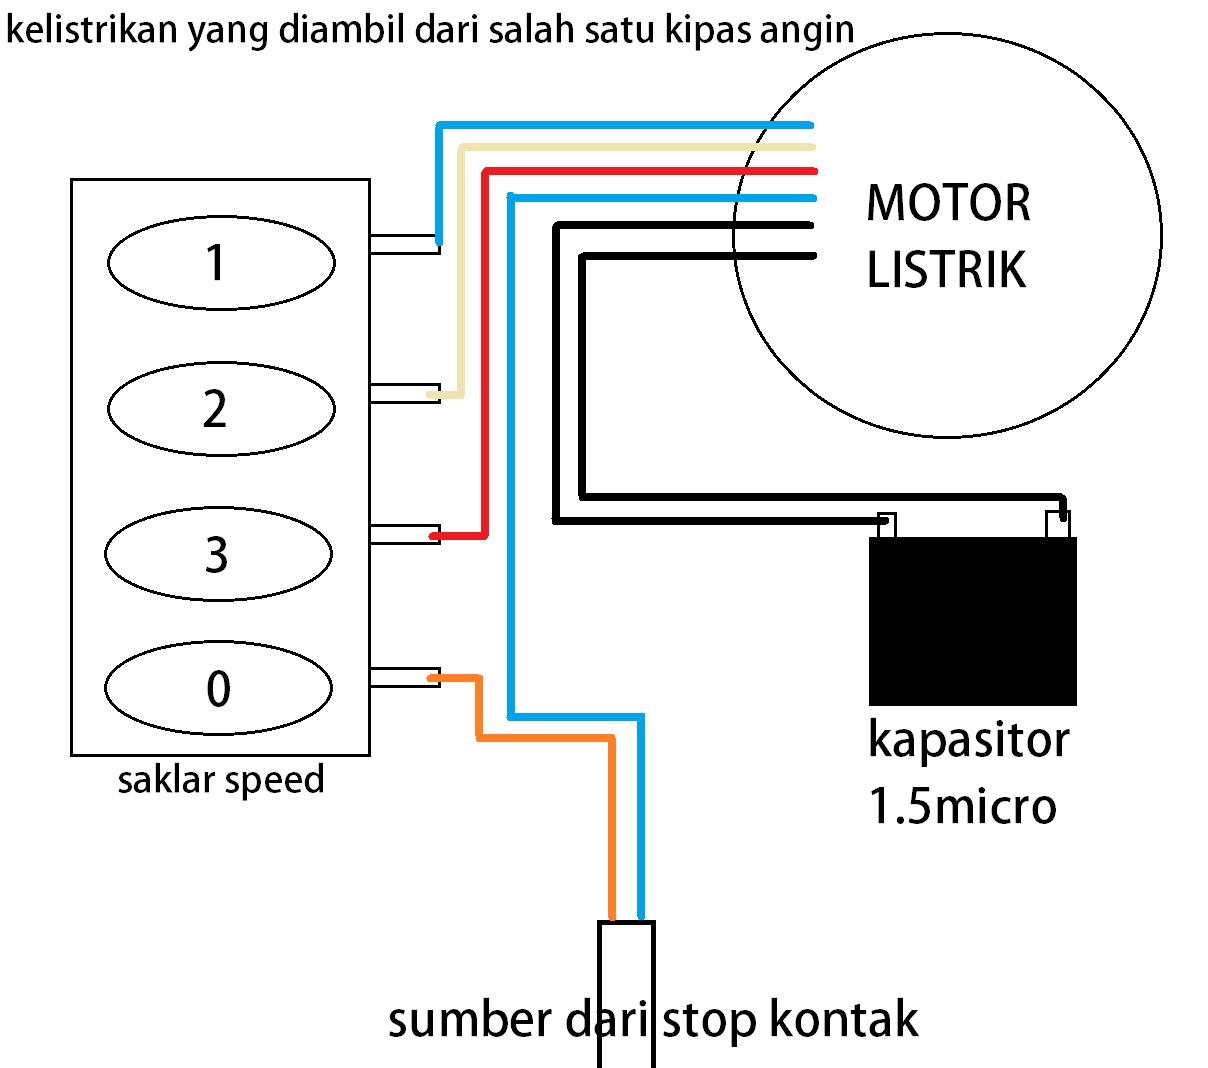 2002 mitsubishi lancer es stereo wiring diagram john deere 100 series motor kapasitor gallery - sample and guide